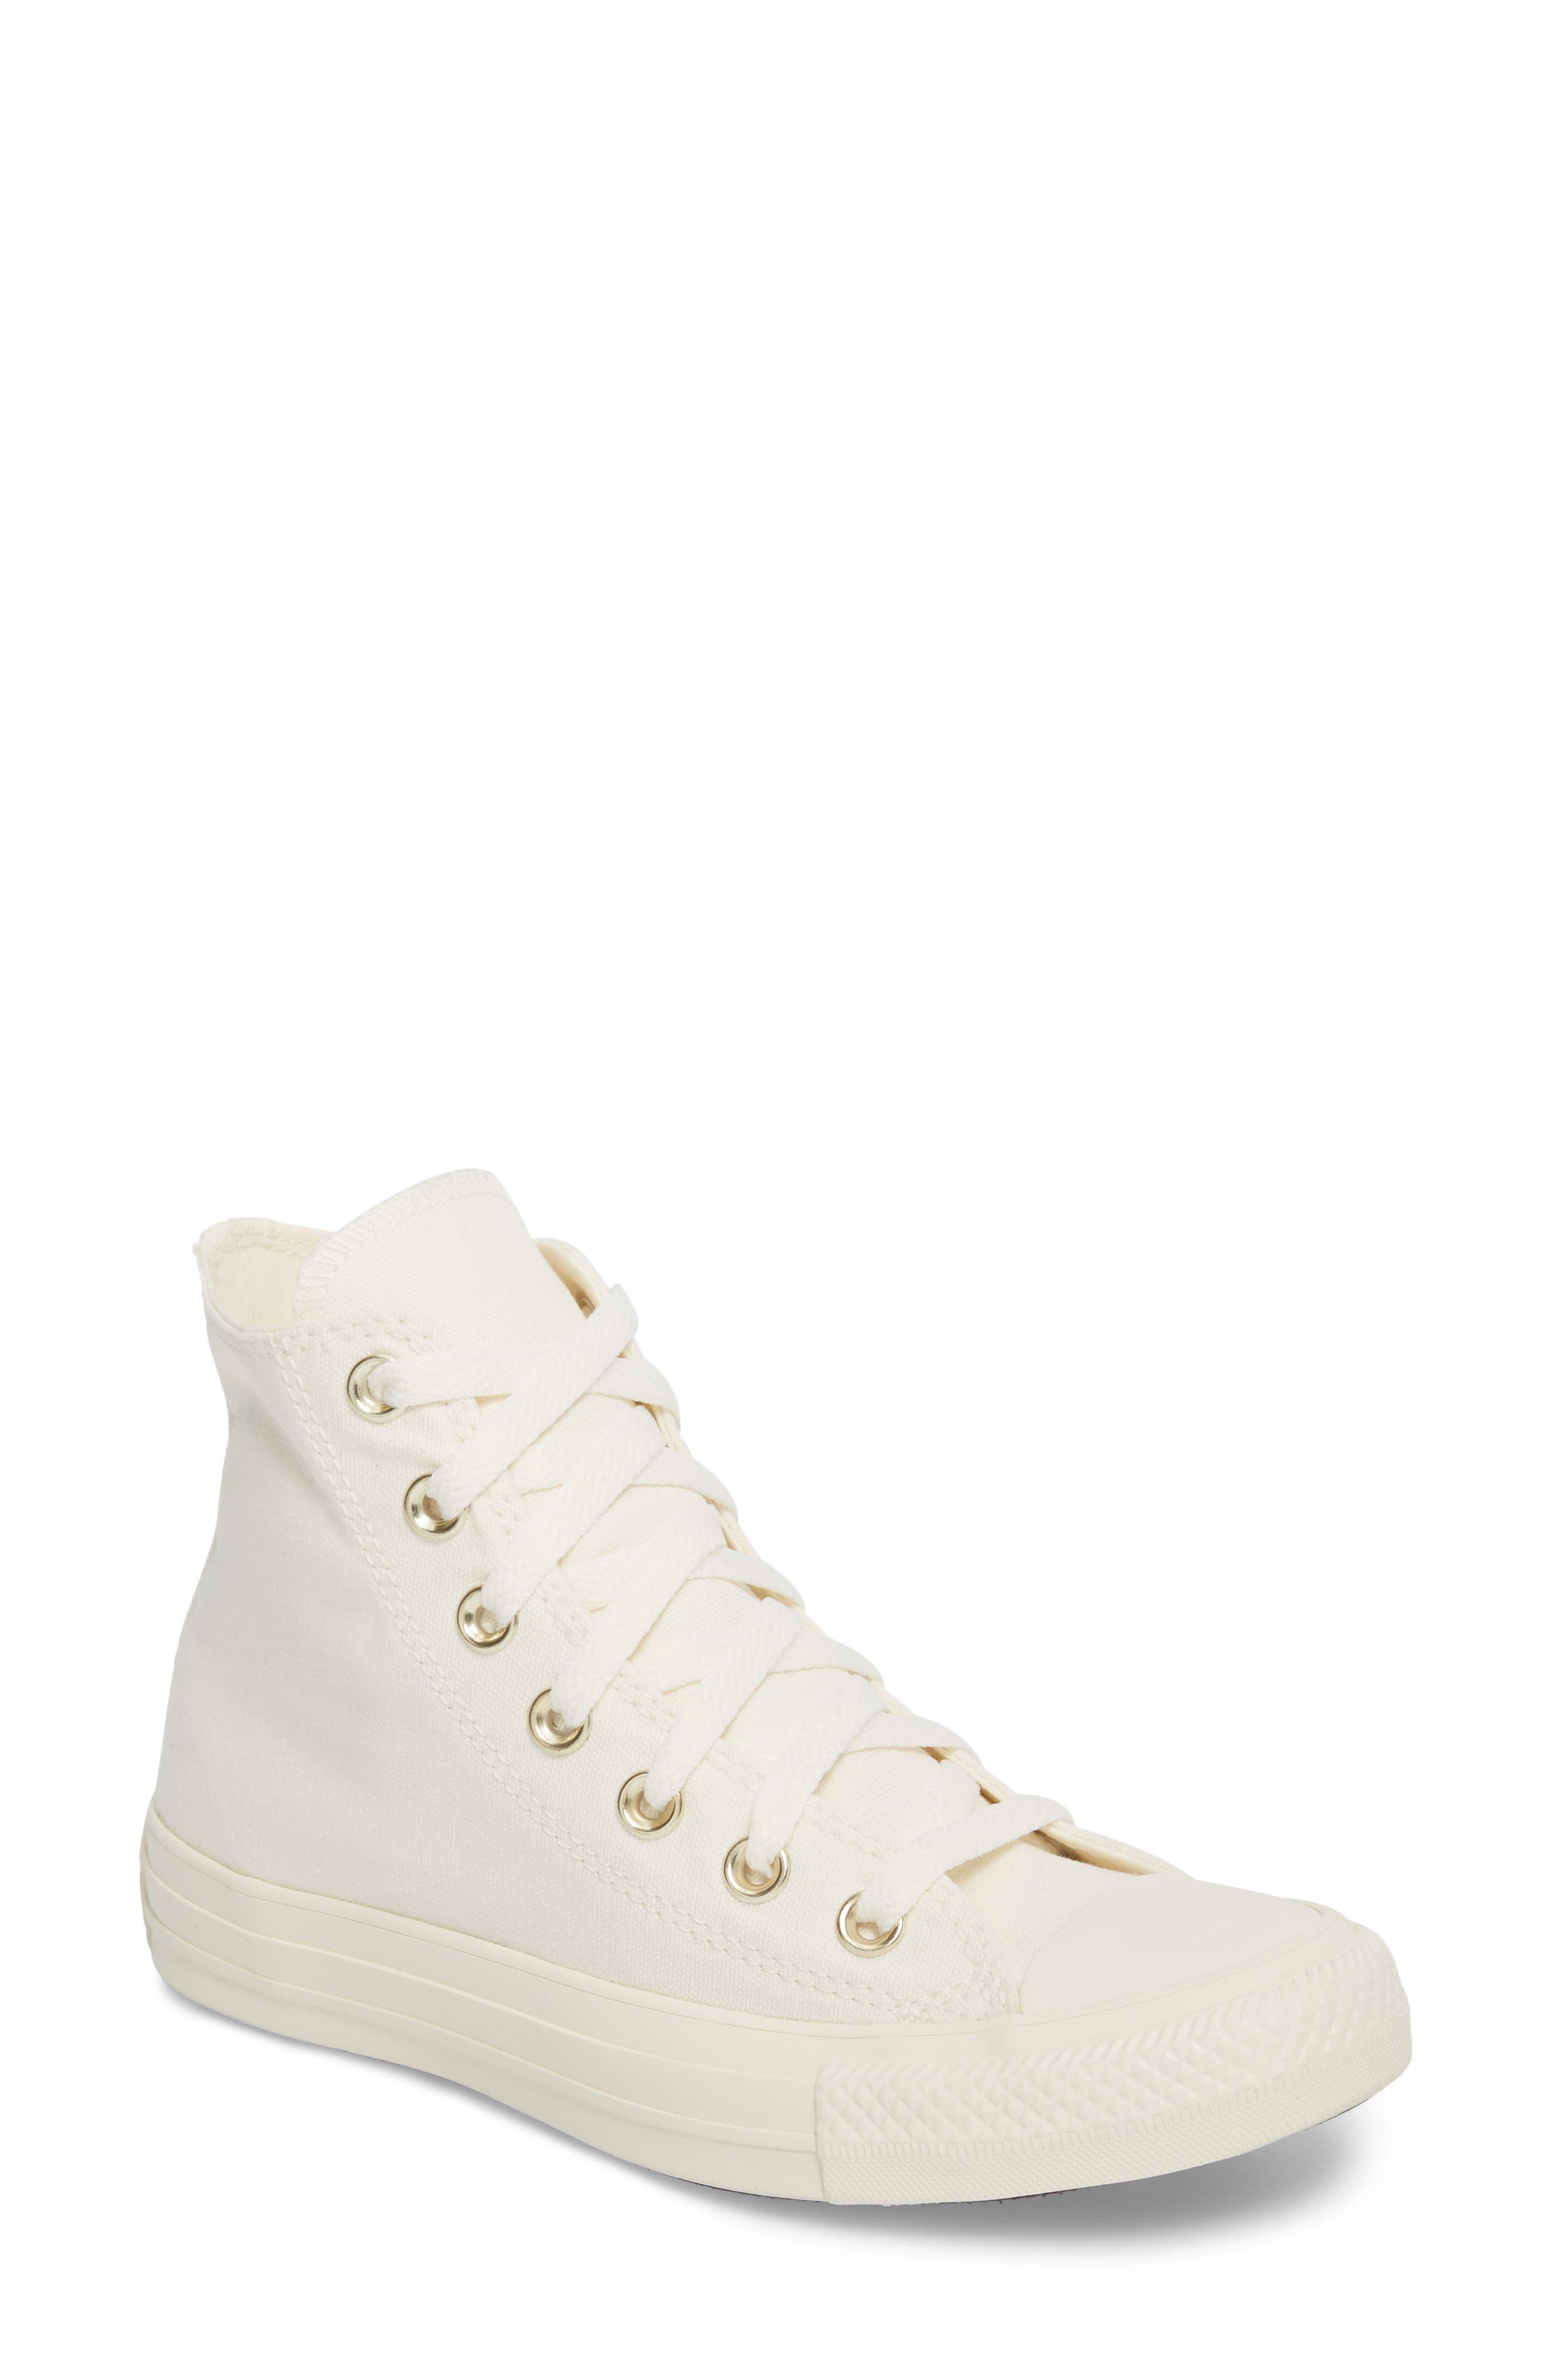 Main Image - Converse Chuck Taylor® All Star® Hi Sneaker (Women)